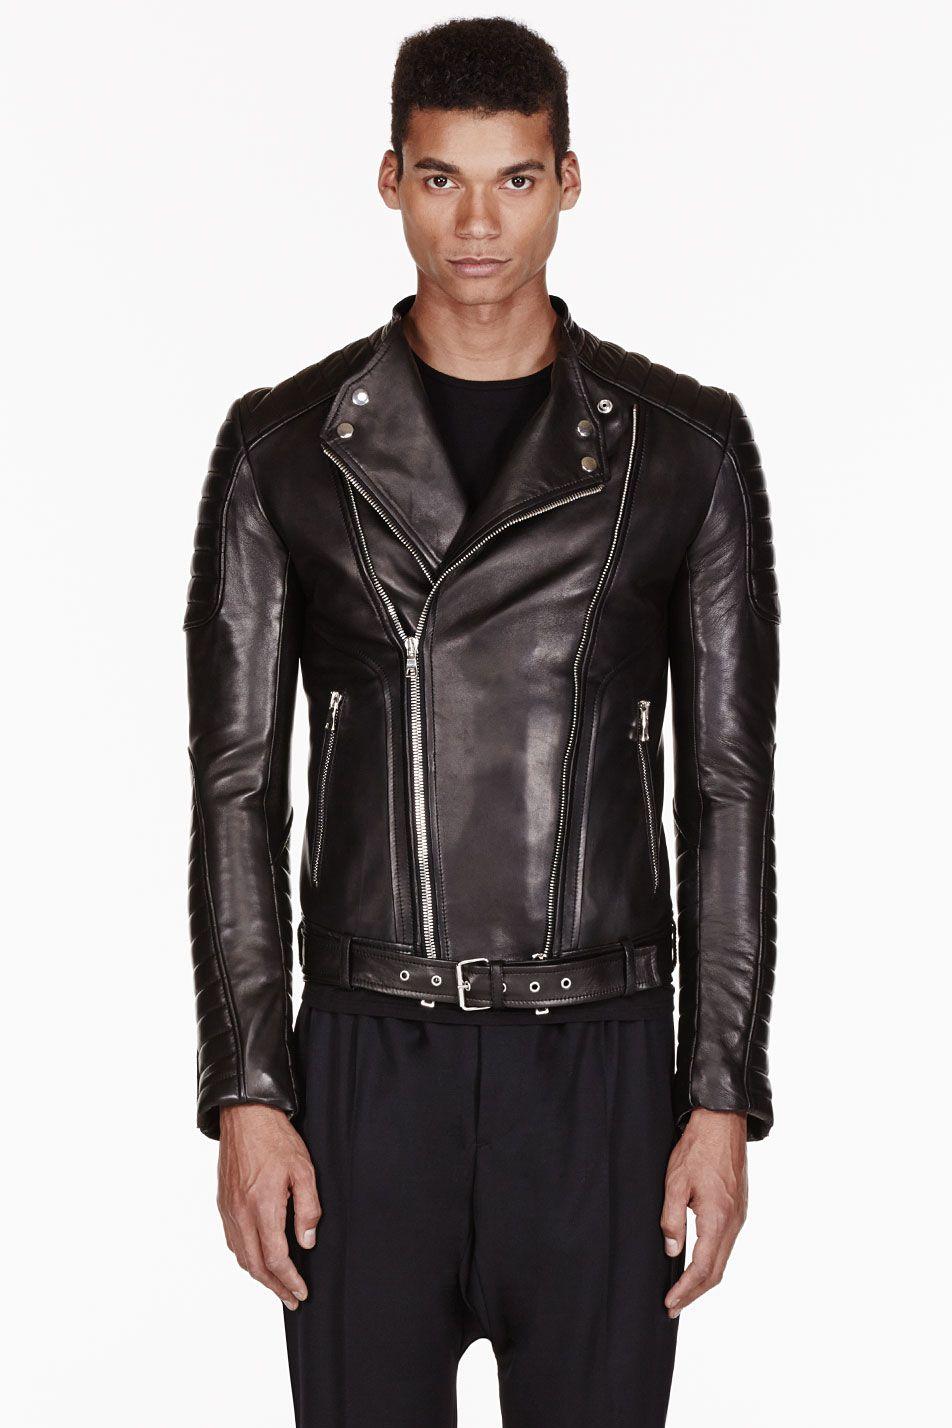 Balmain Black Leather Ribbed Biker Jacket Ssense Leather Fashion Men Jackets Men Fashion Balmain Leather Jacket [ 1428 x 952 Pixel ]